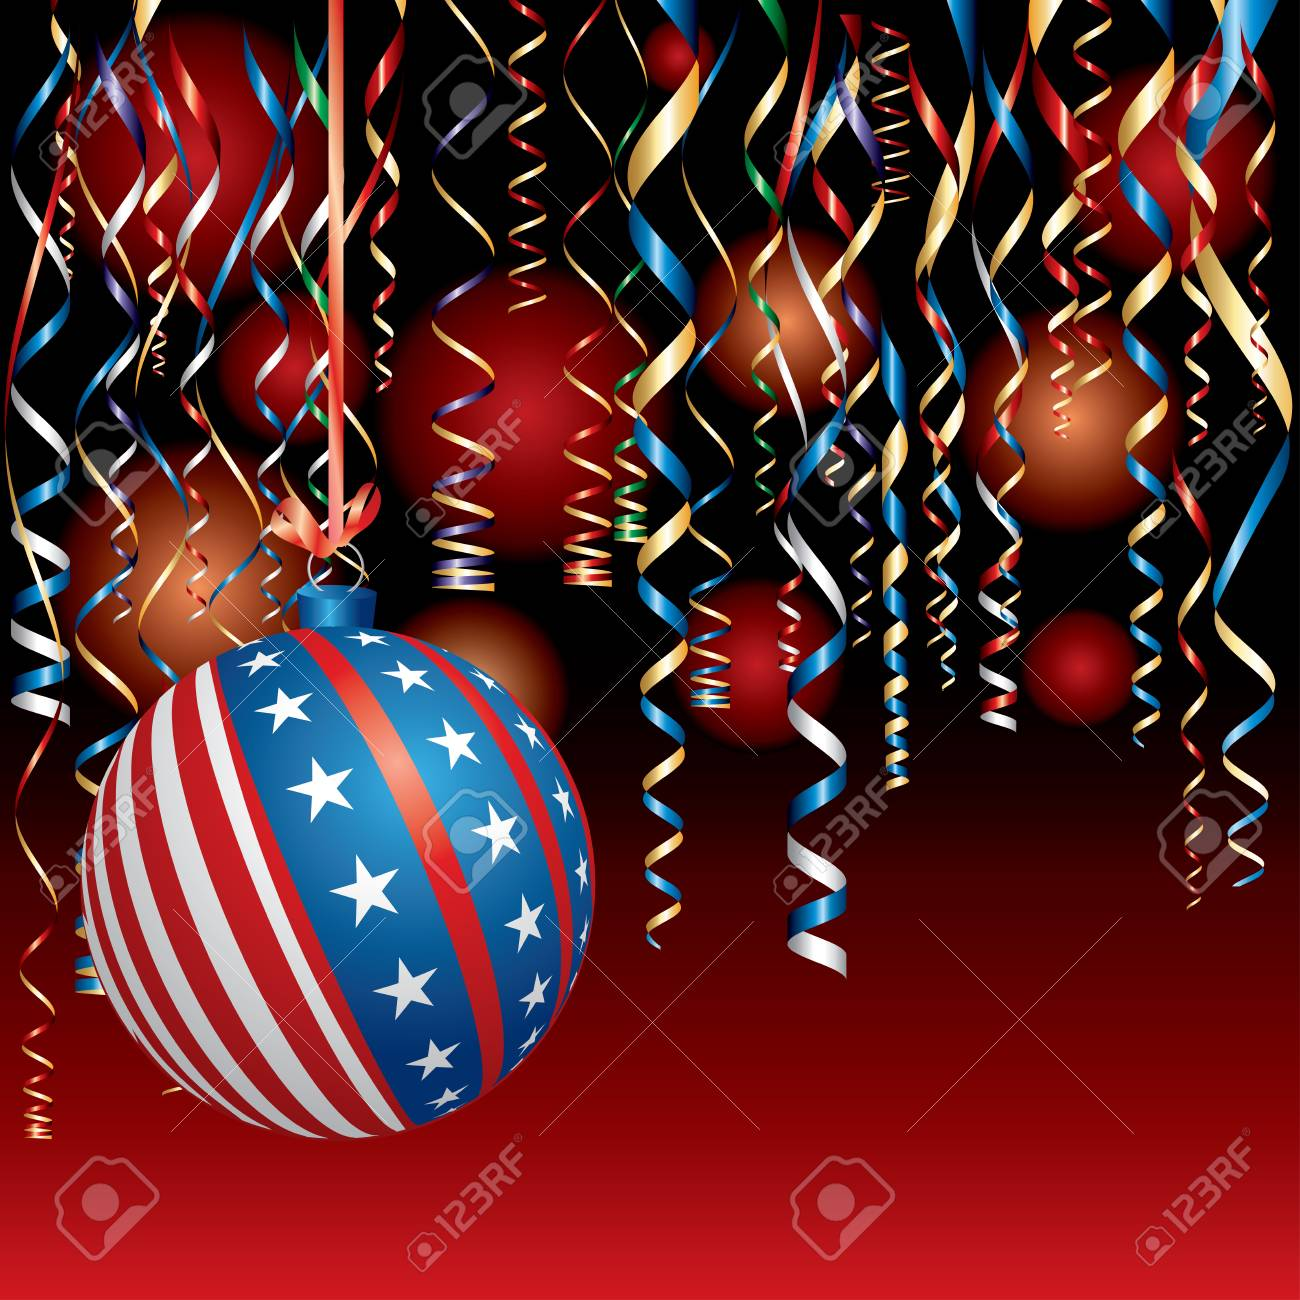 Patriotic Christmas Background.Illustration With Usa Christmas Ball Patriotic Background